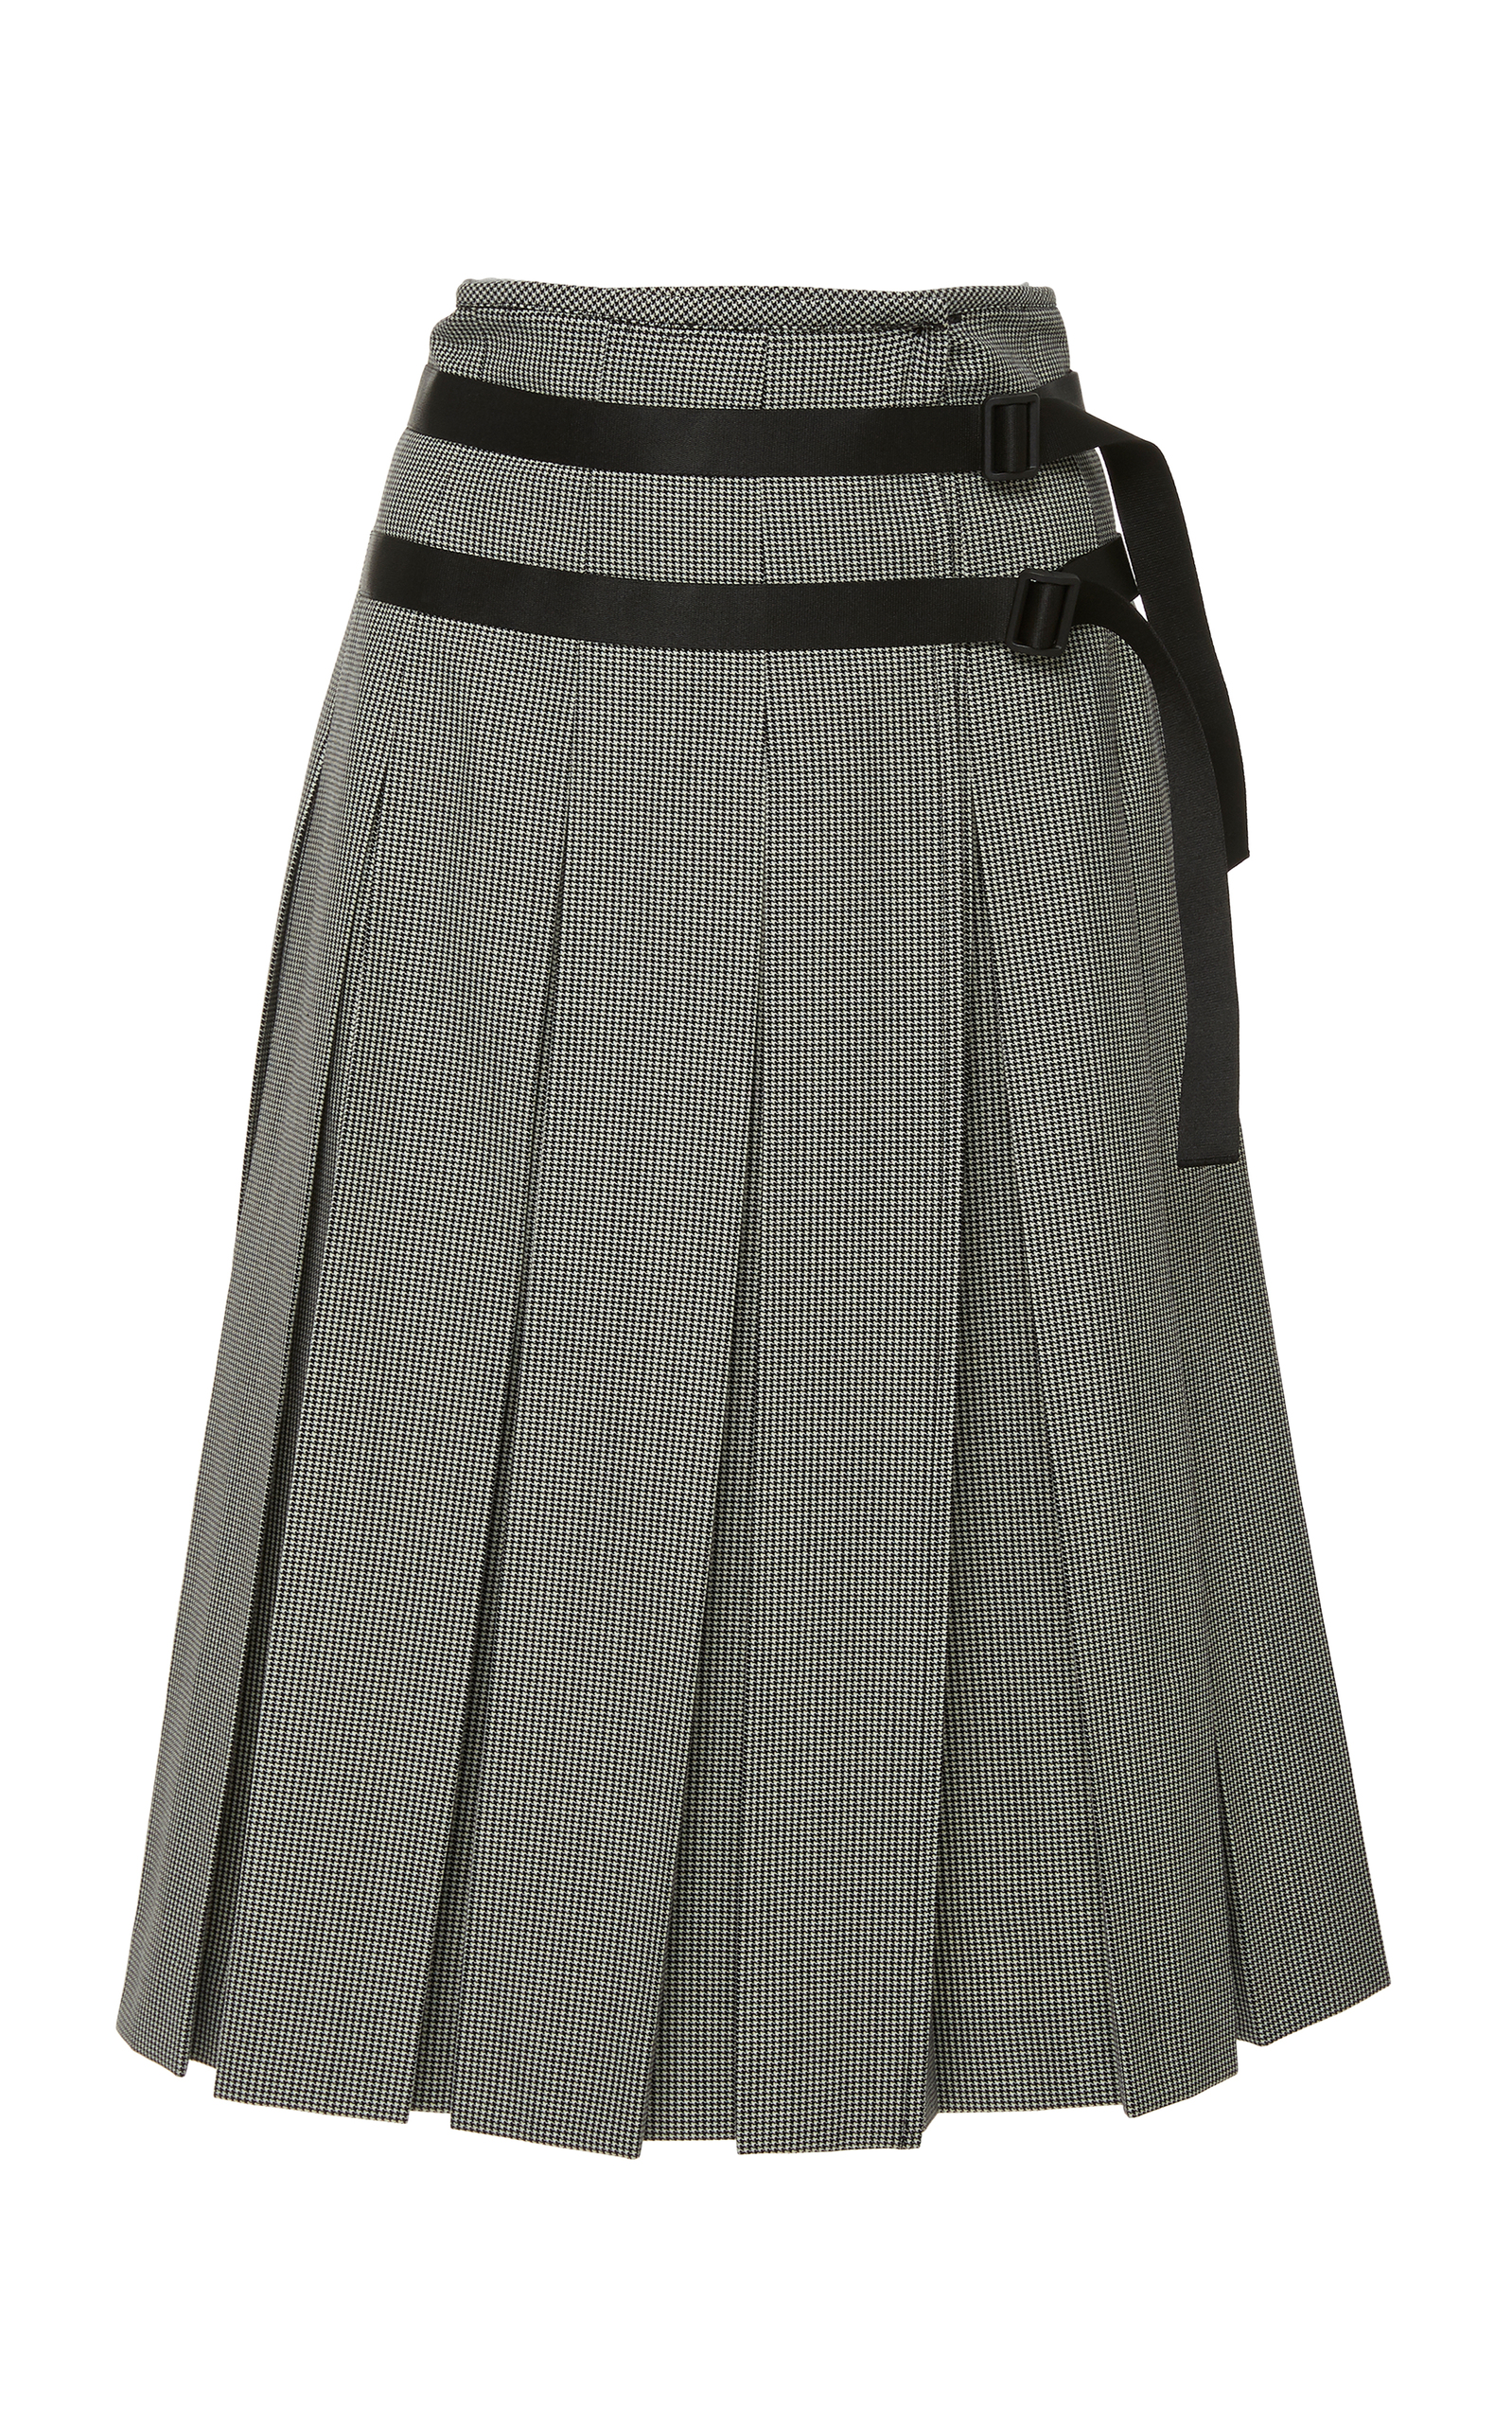 93fba741c957c5 Pepita Wool Pleated Skirt by Tomas Maier   Moda Operandi